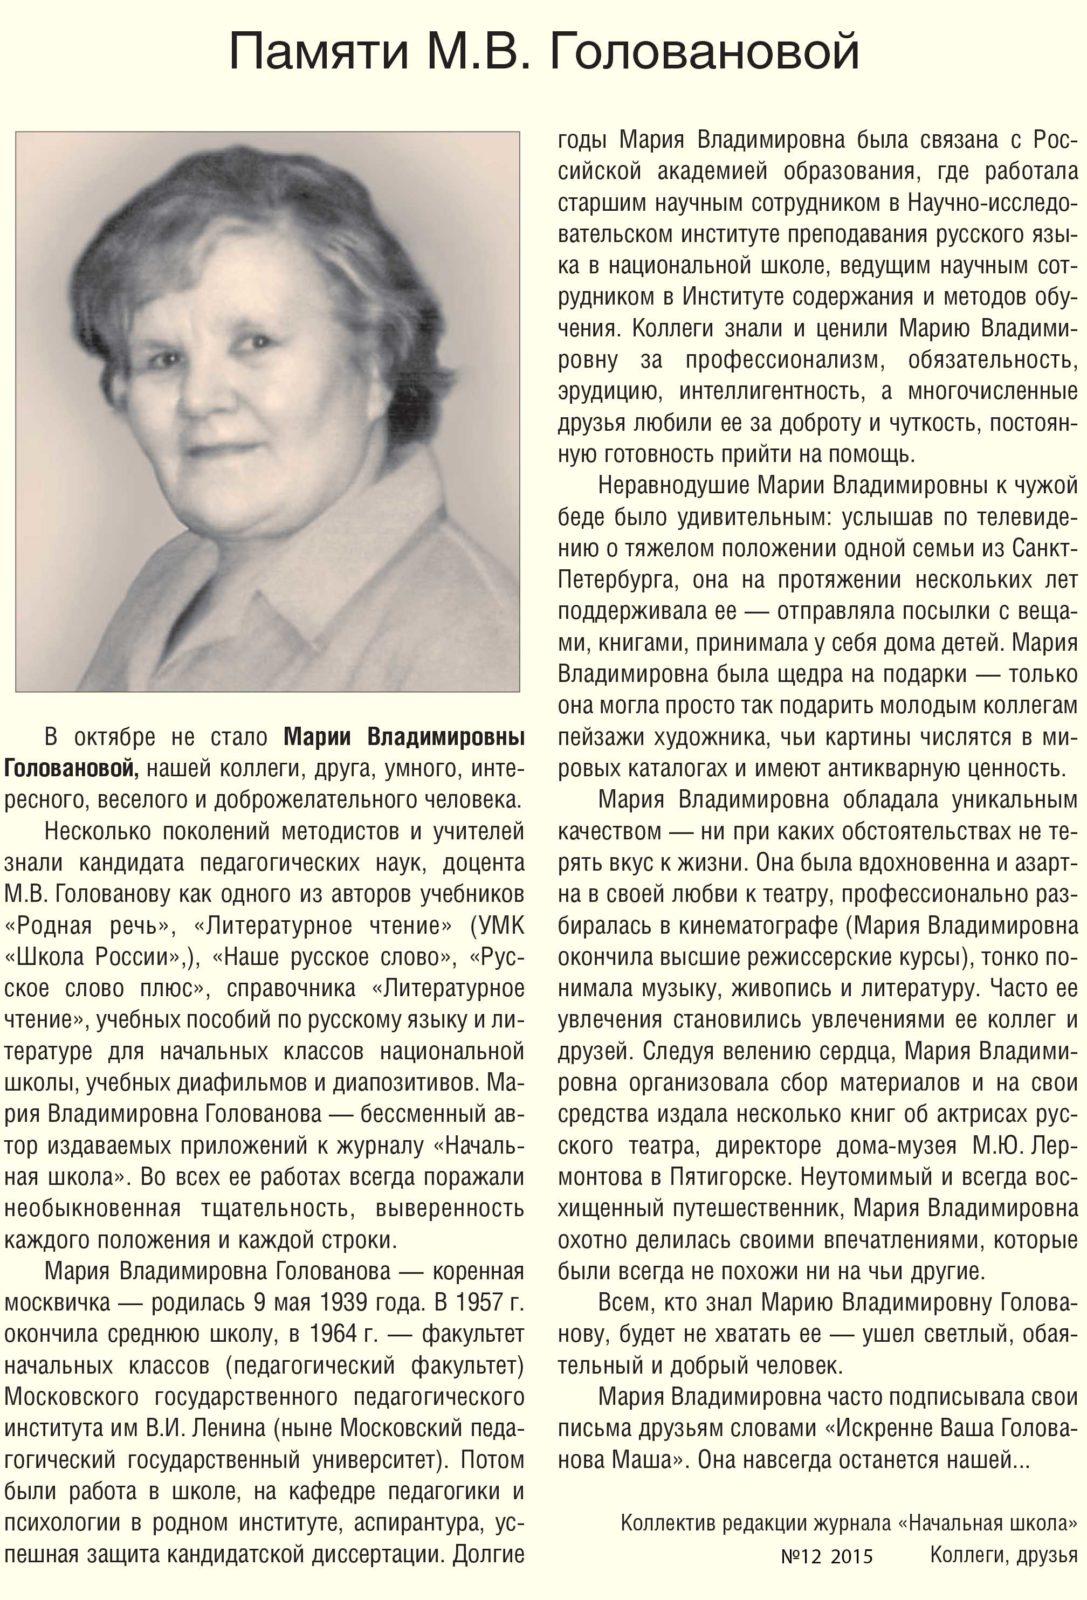 М. Голованова